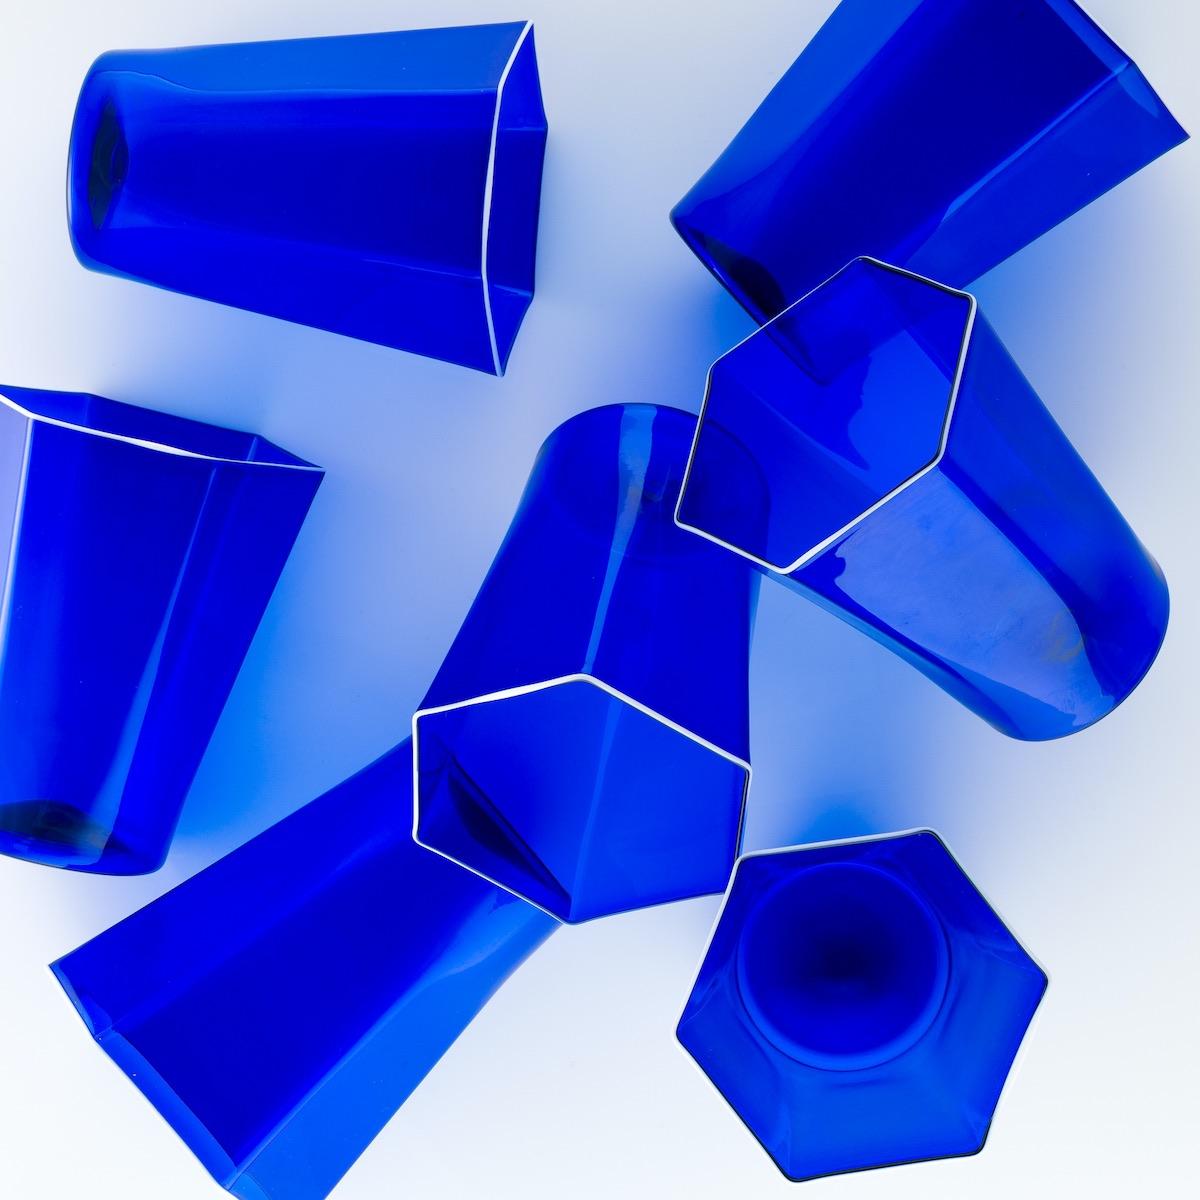 laguna-blue-luxe-murano-glassware-tableware